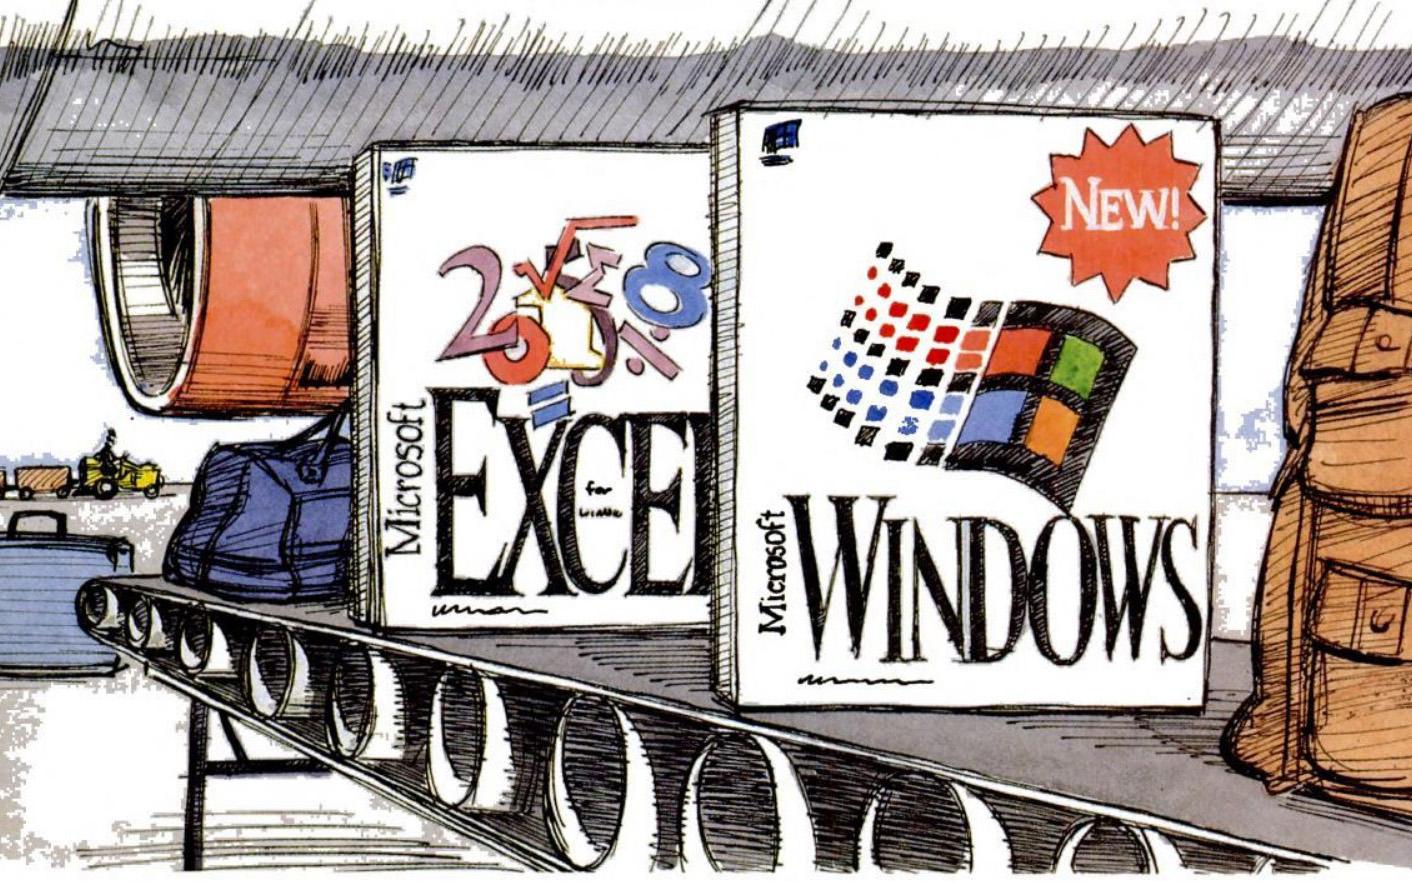 Windows 3.1 ad